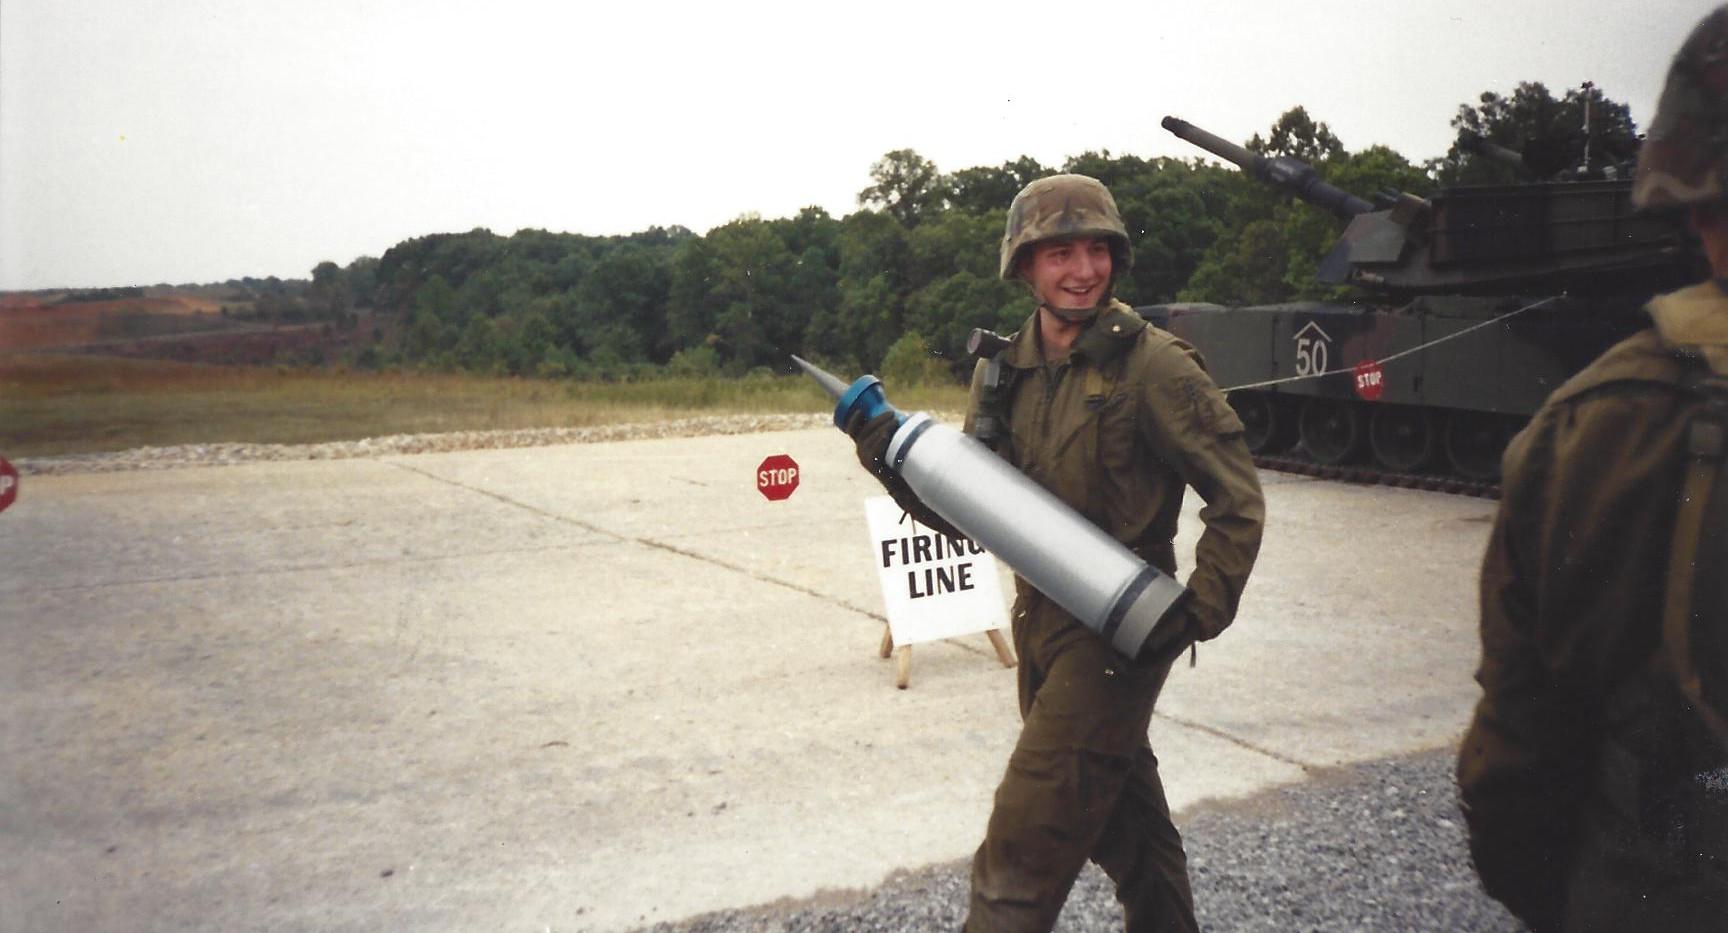 M1 Abrams Armor Crewman Training